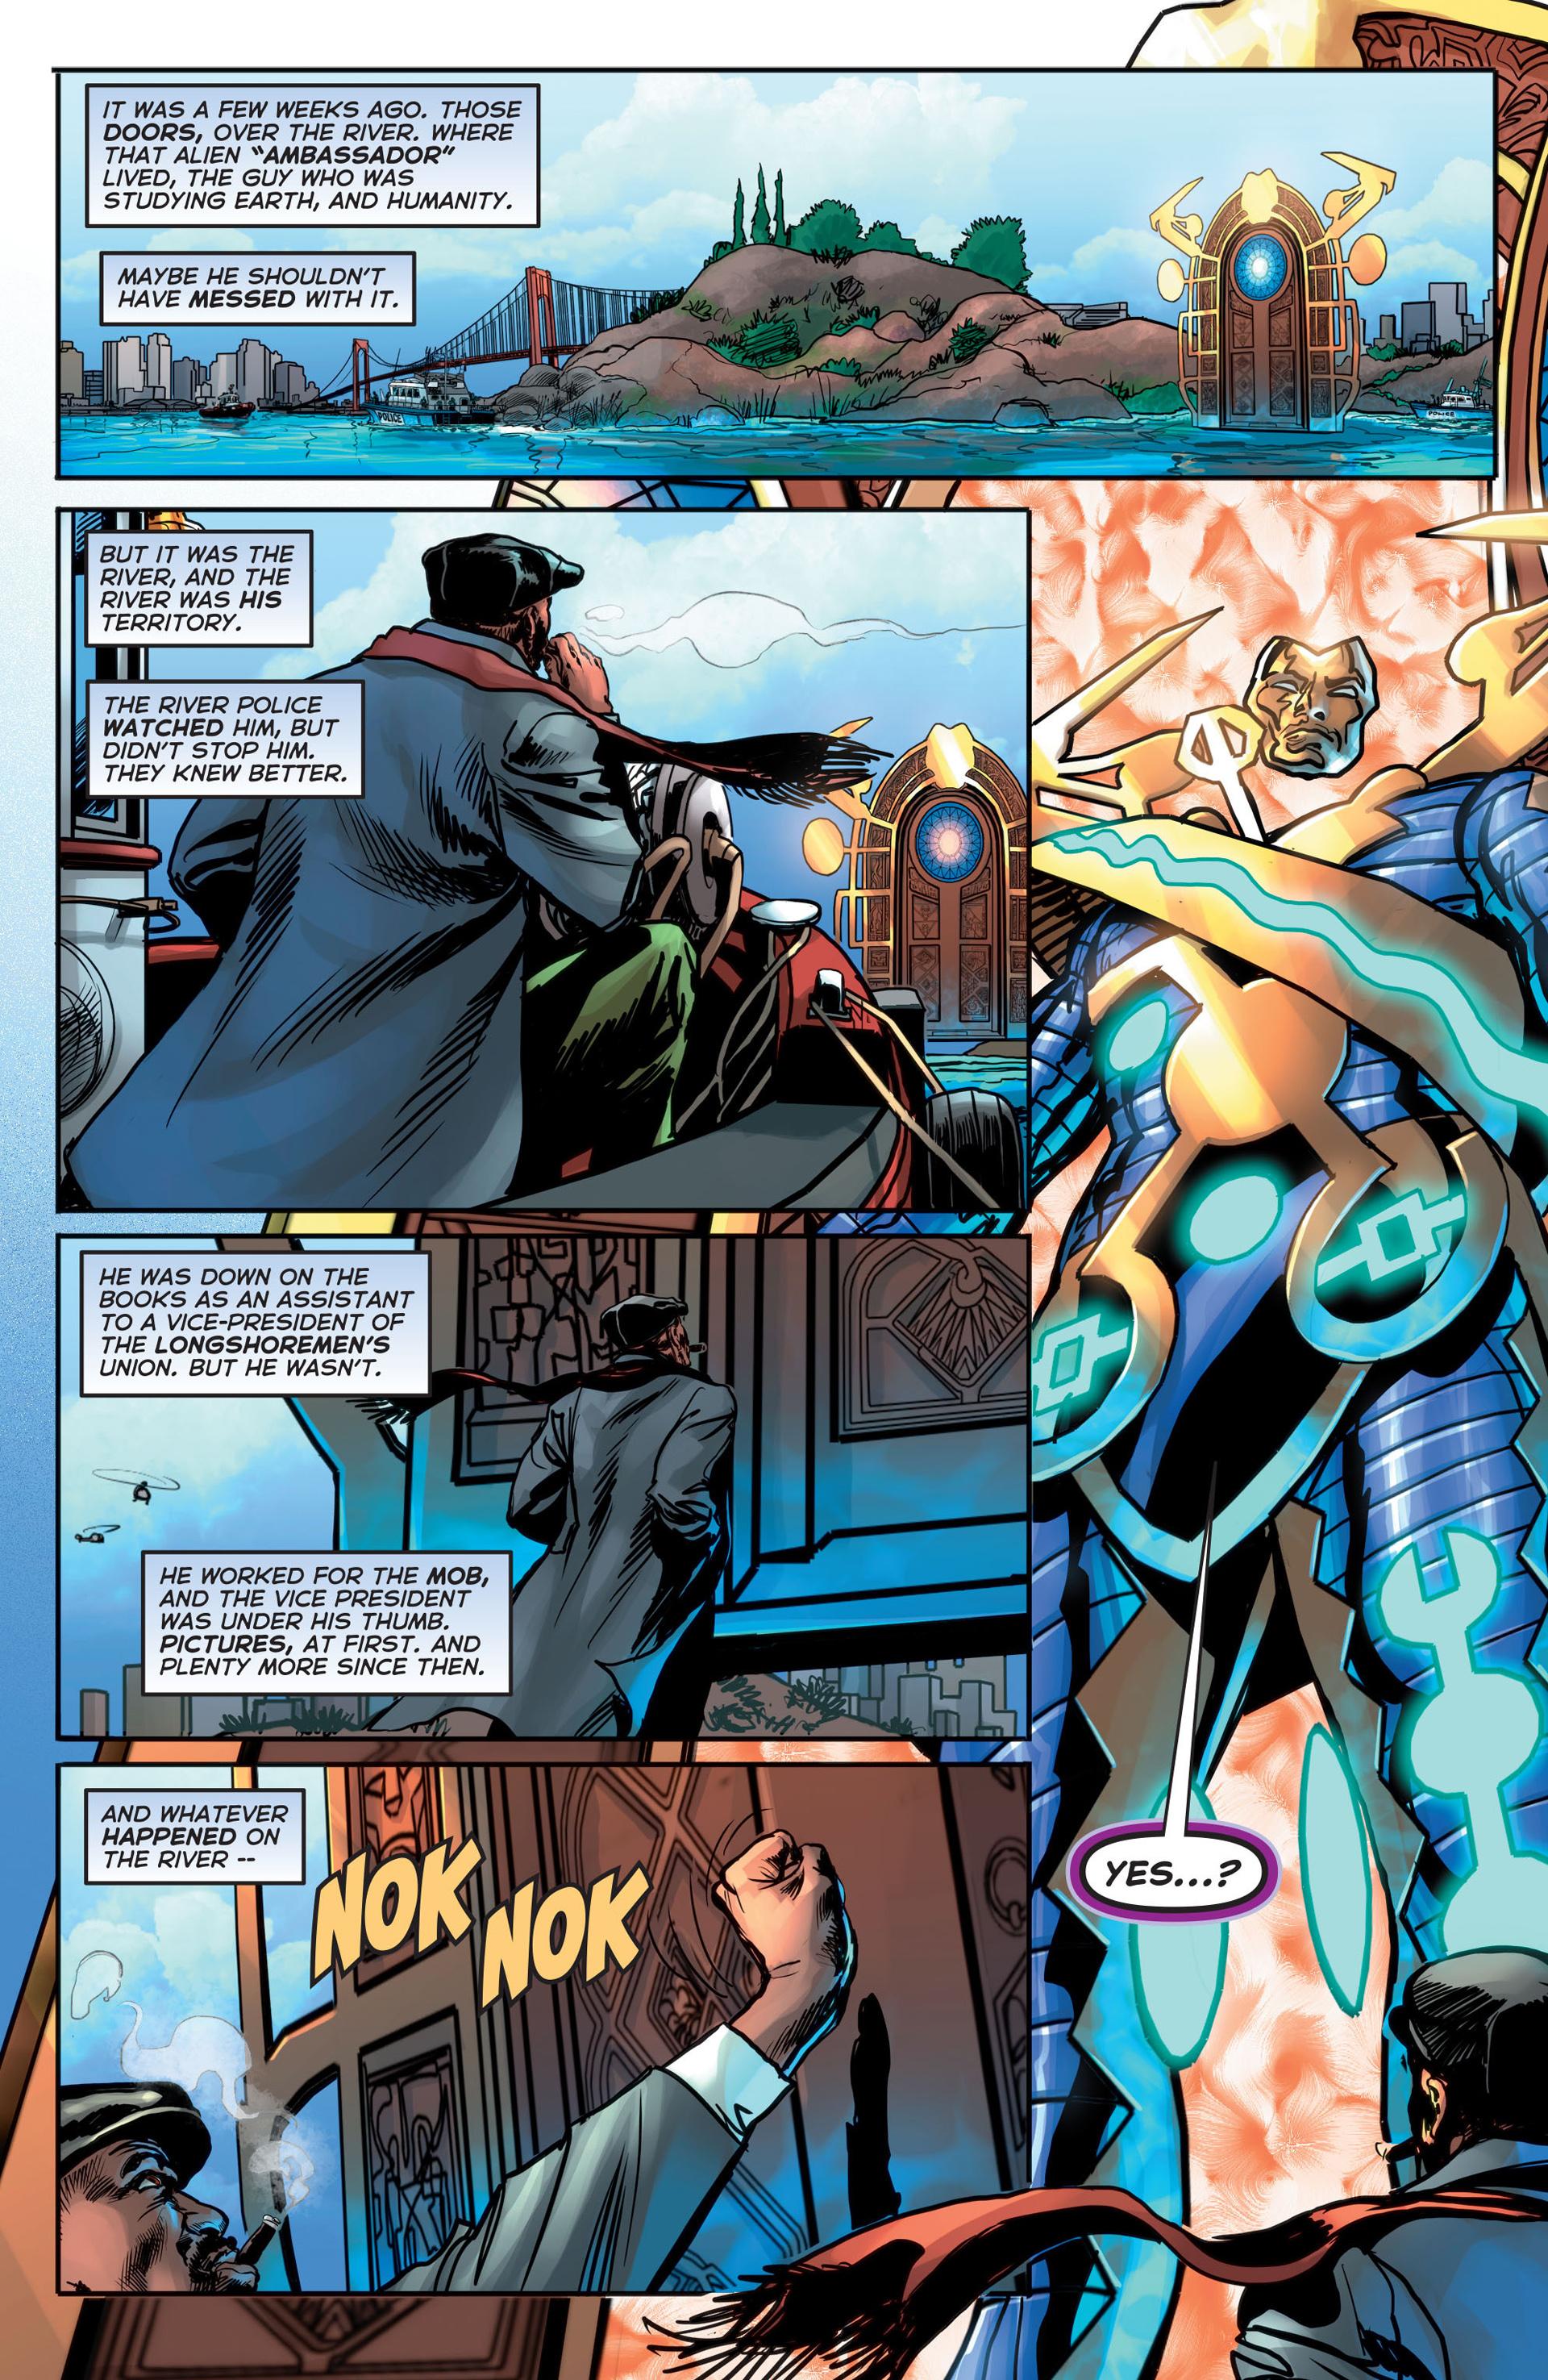 Read online Astro City comic -  Issue #6 - 4